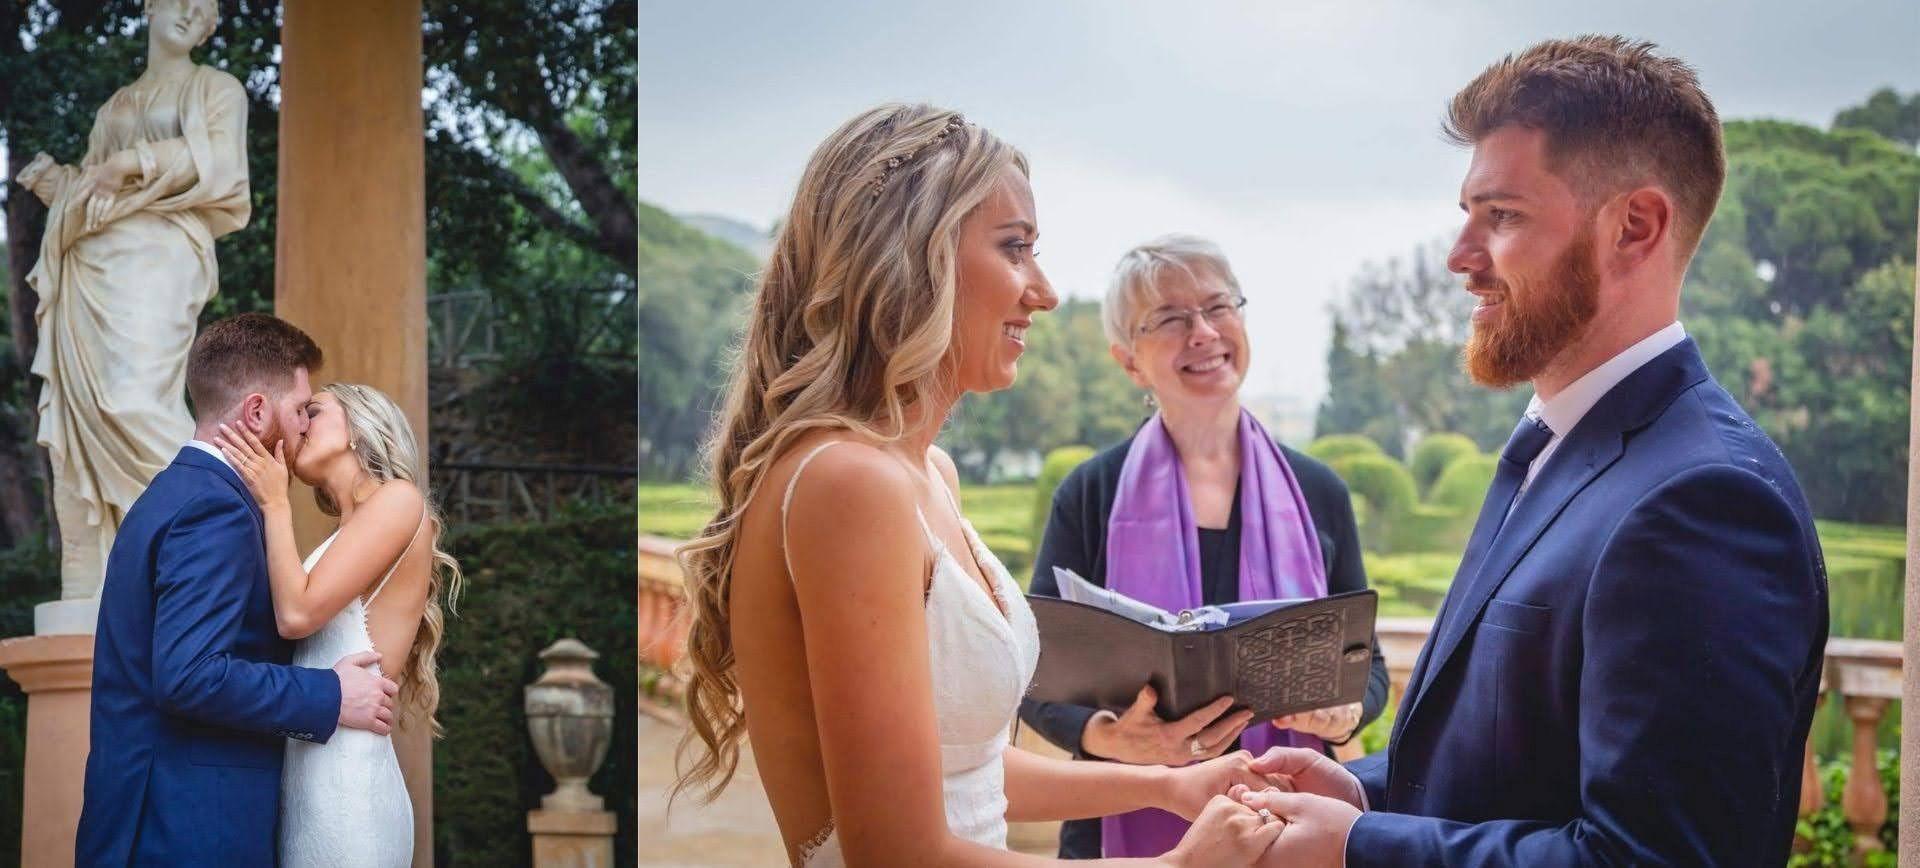 Barcelona wedding ceremony in labyrinth park